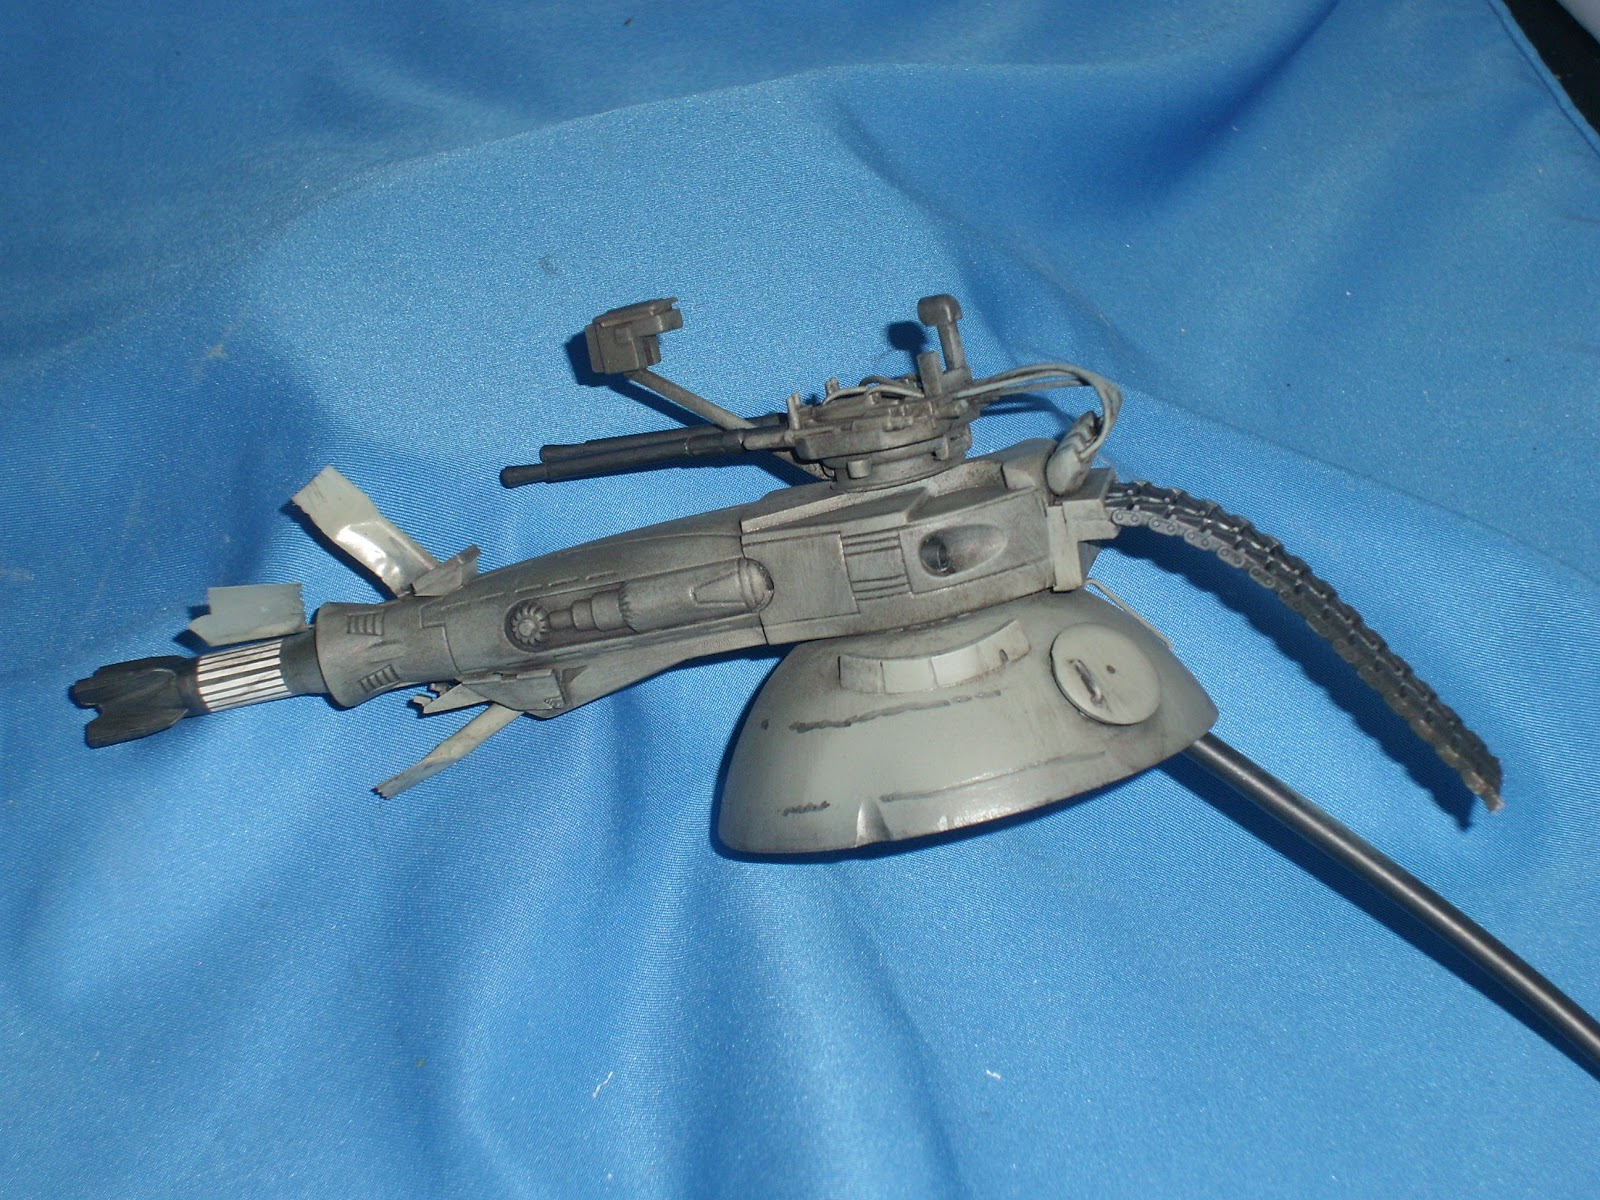 Tha main gun is a belt fed cannon system while the upper gun is a